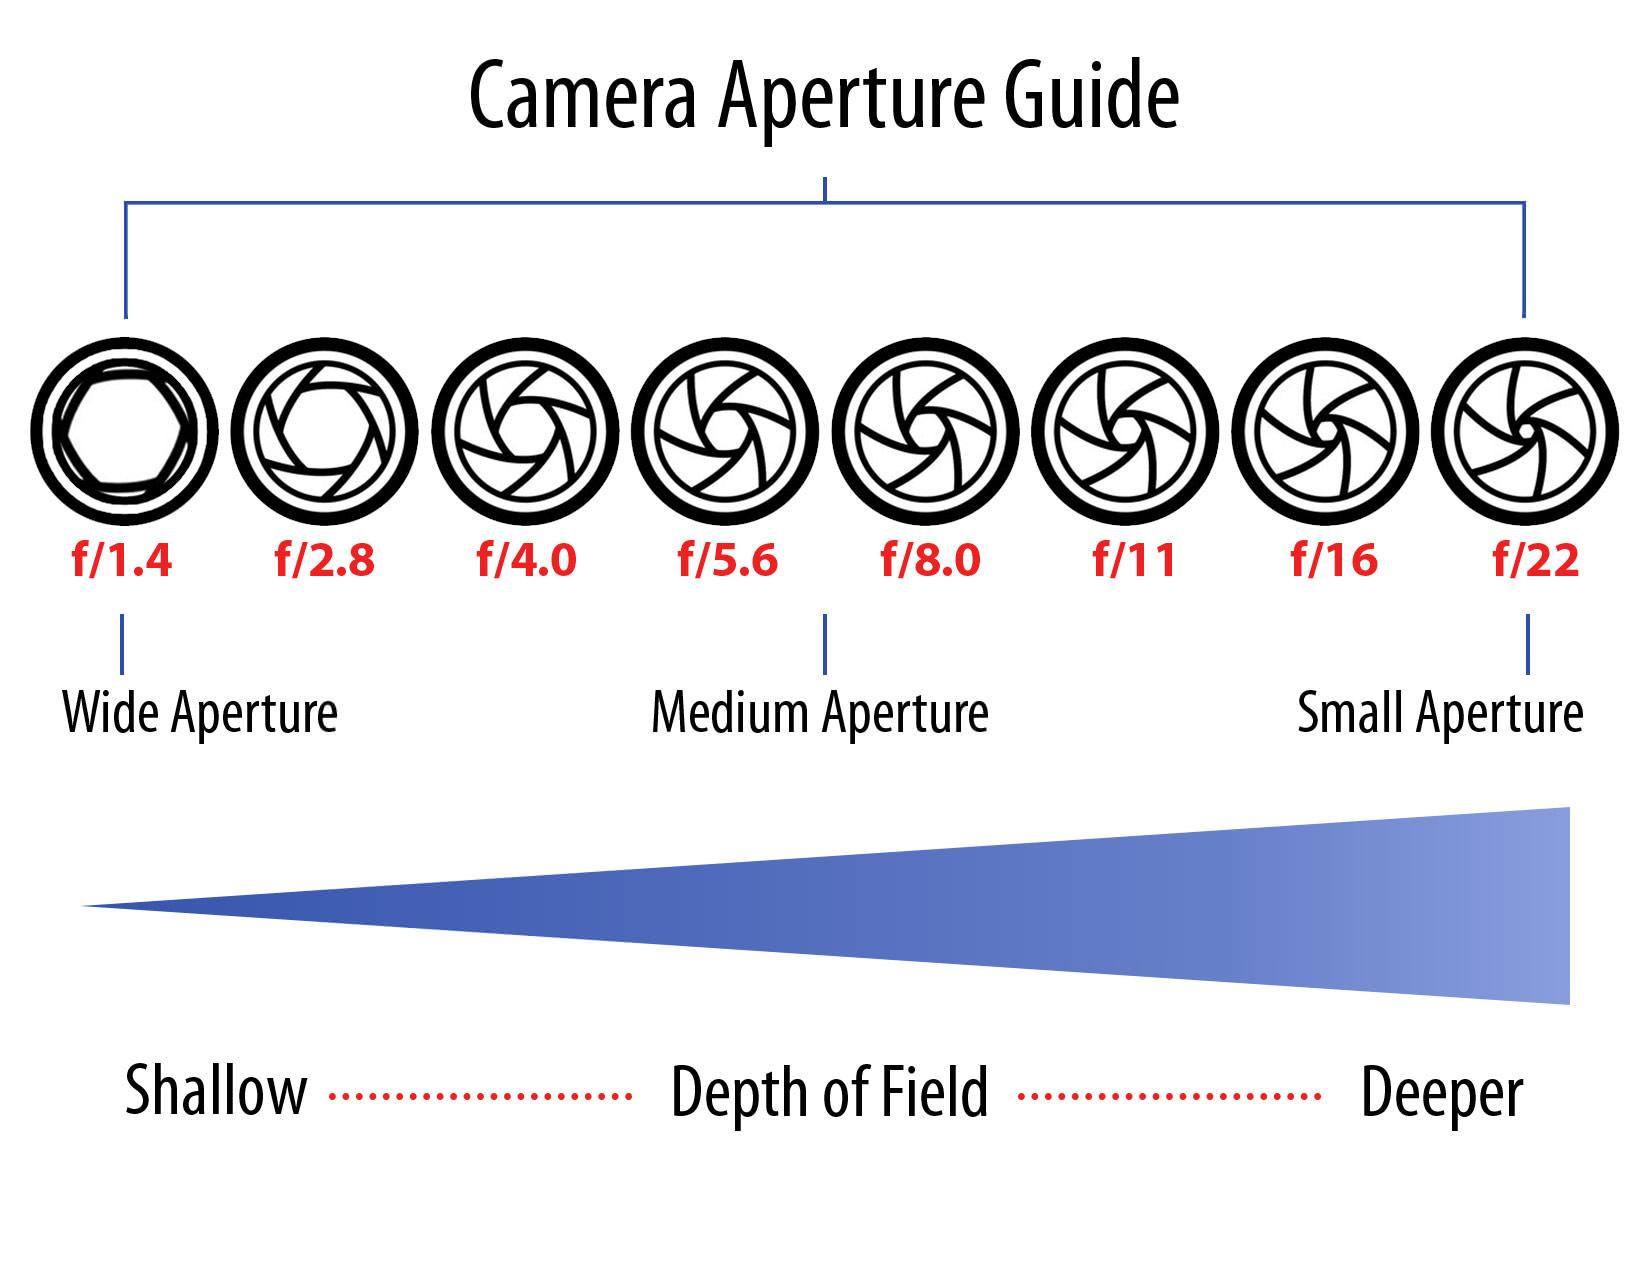 aperture guide jhfdghfkd image